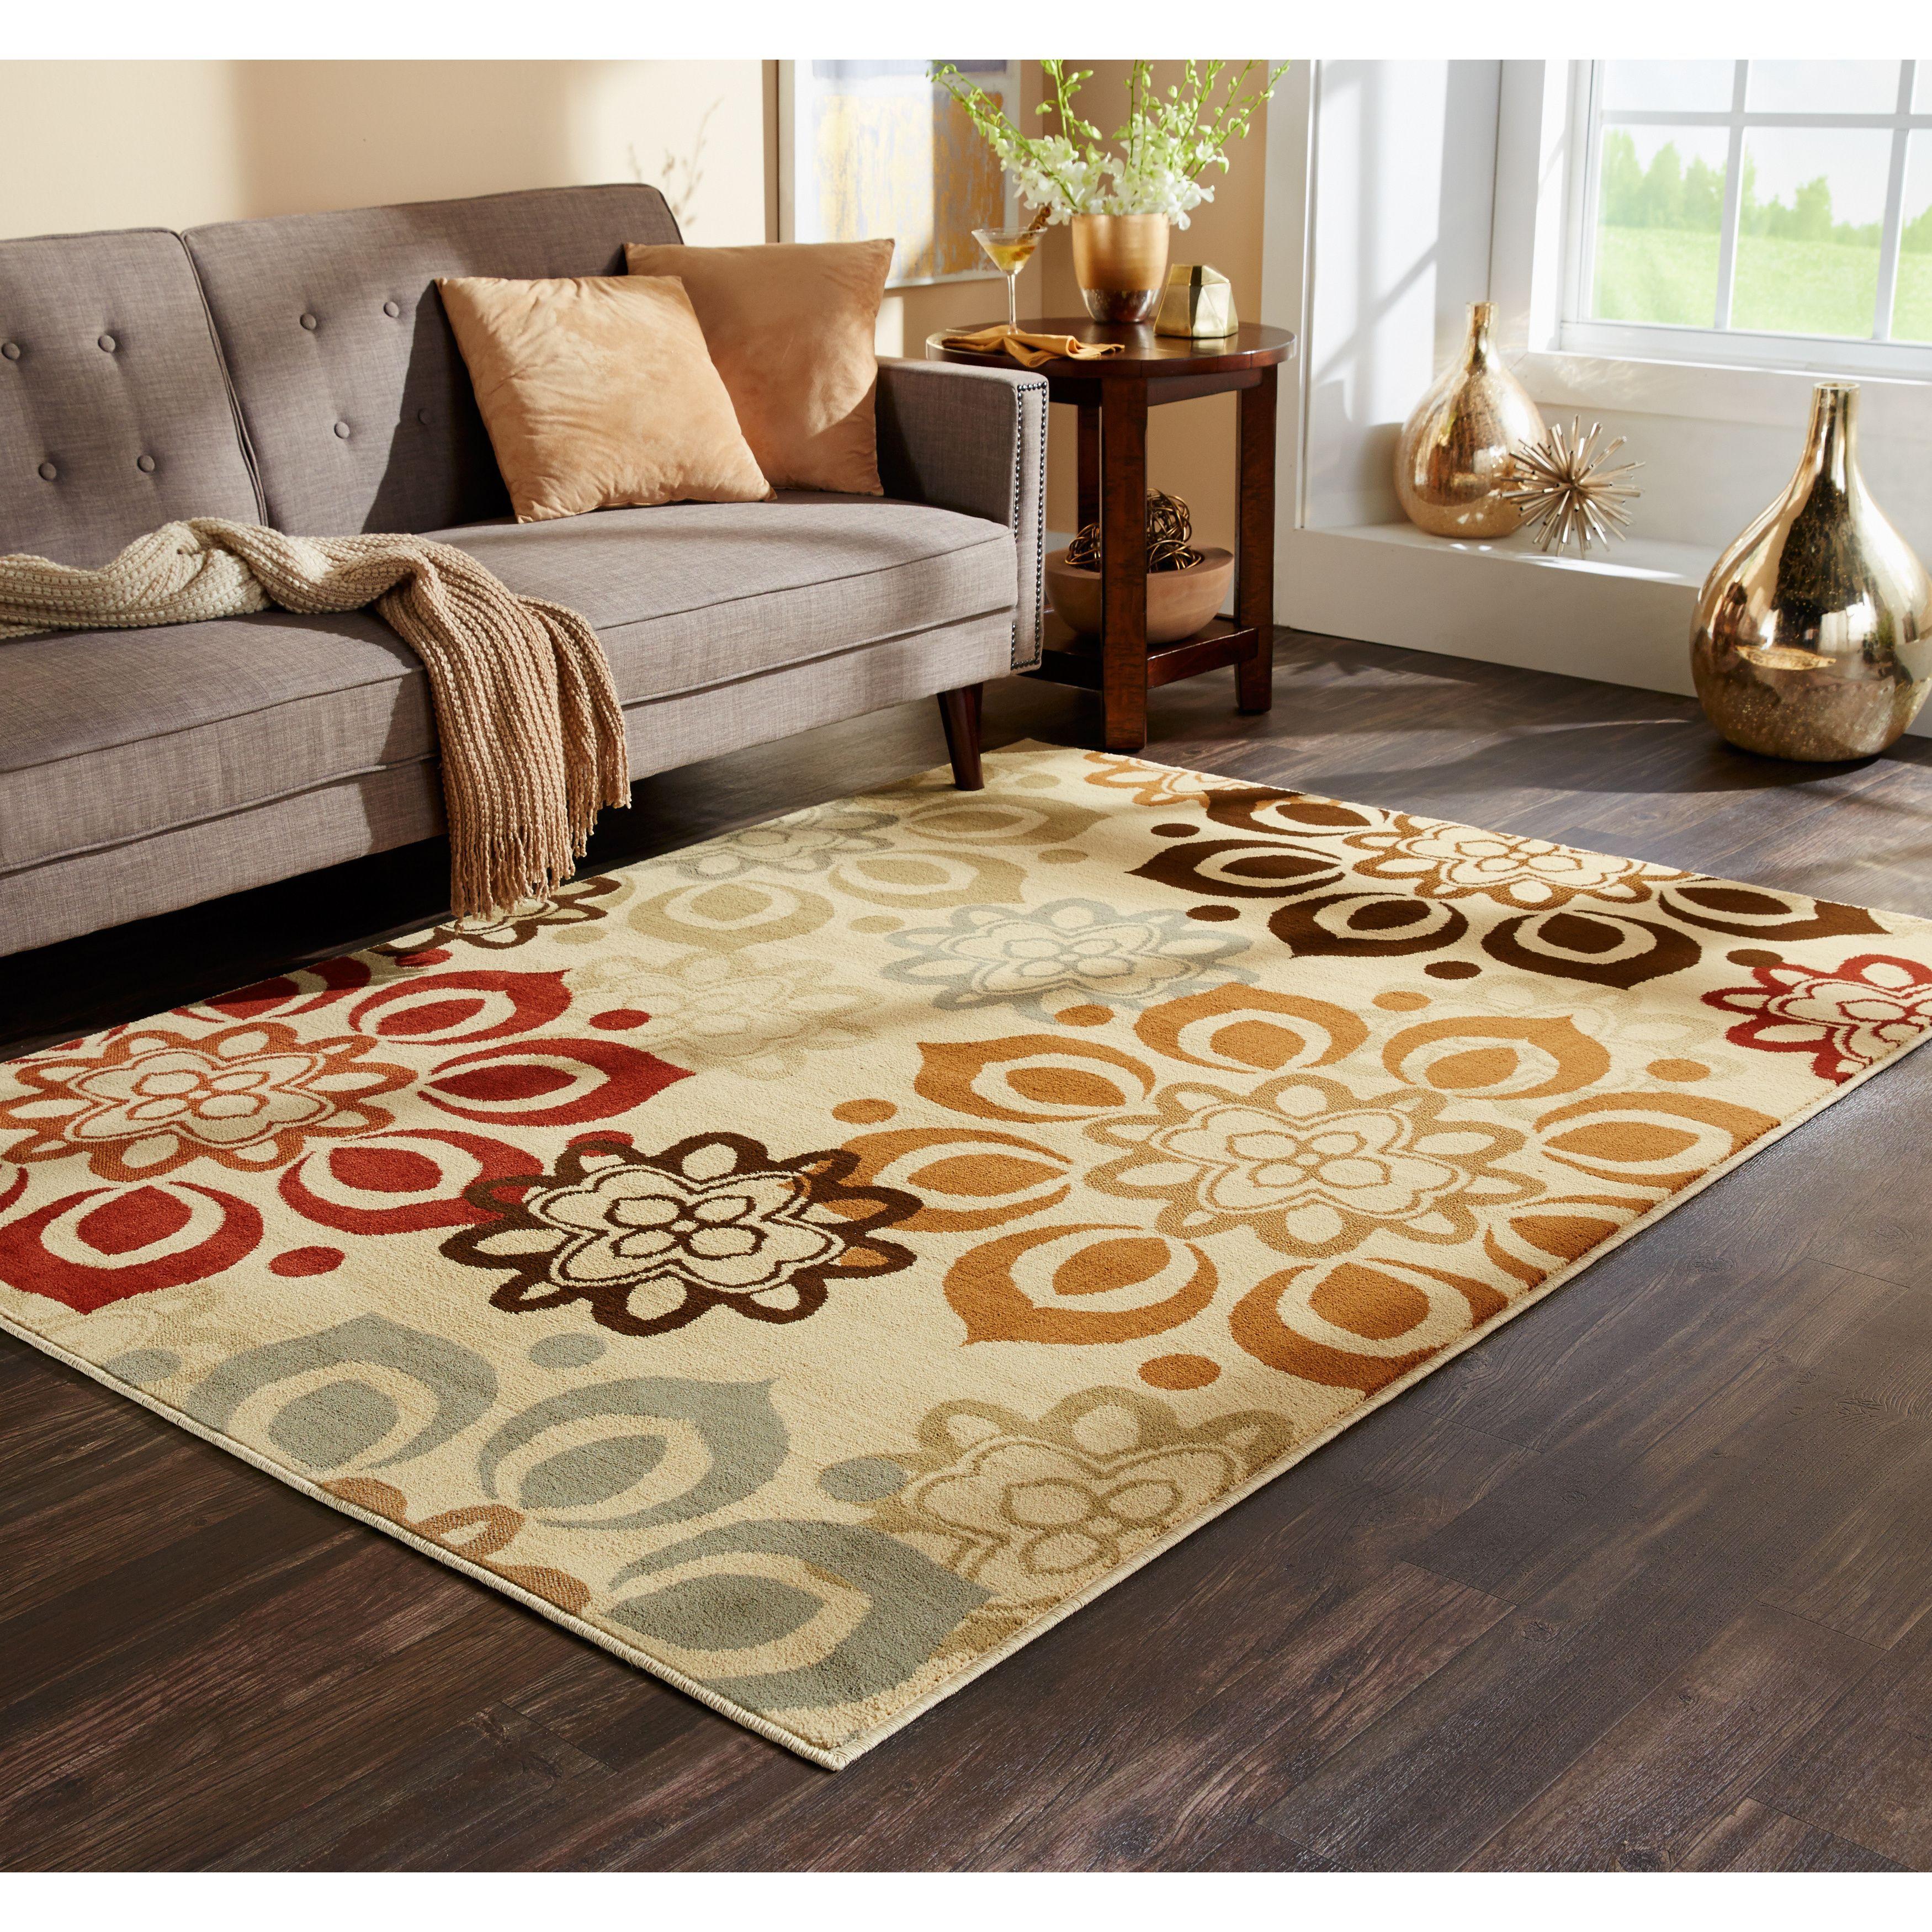 16++ Large living room rugs cream info